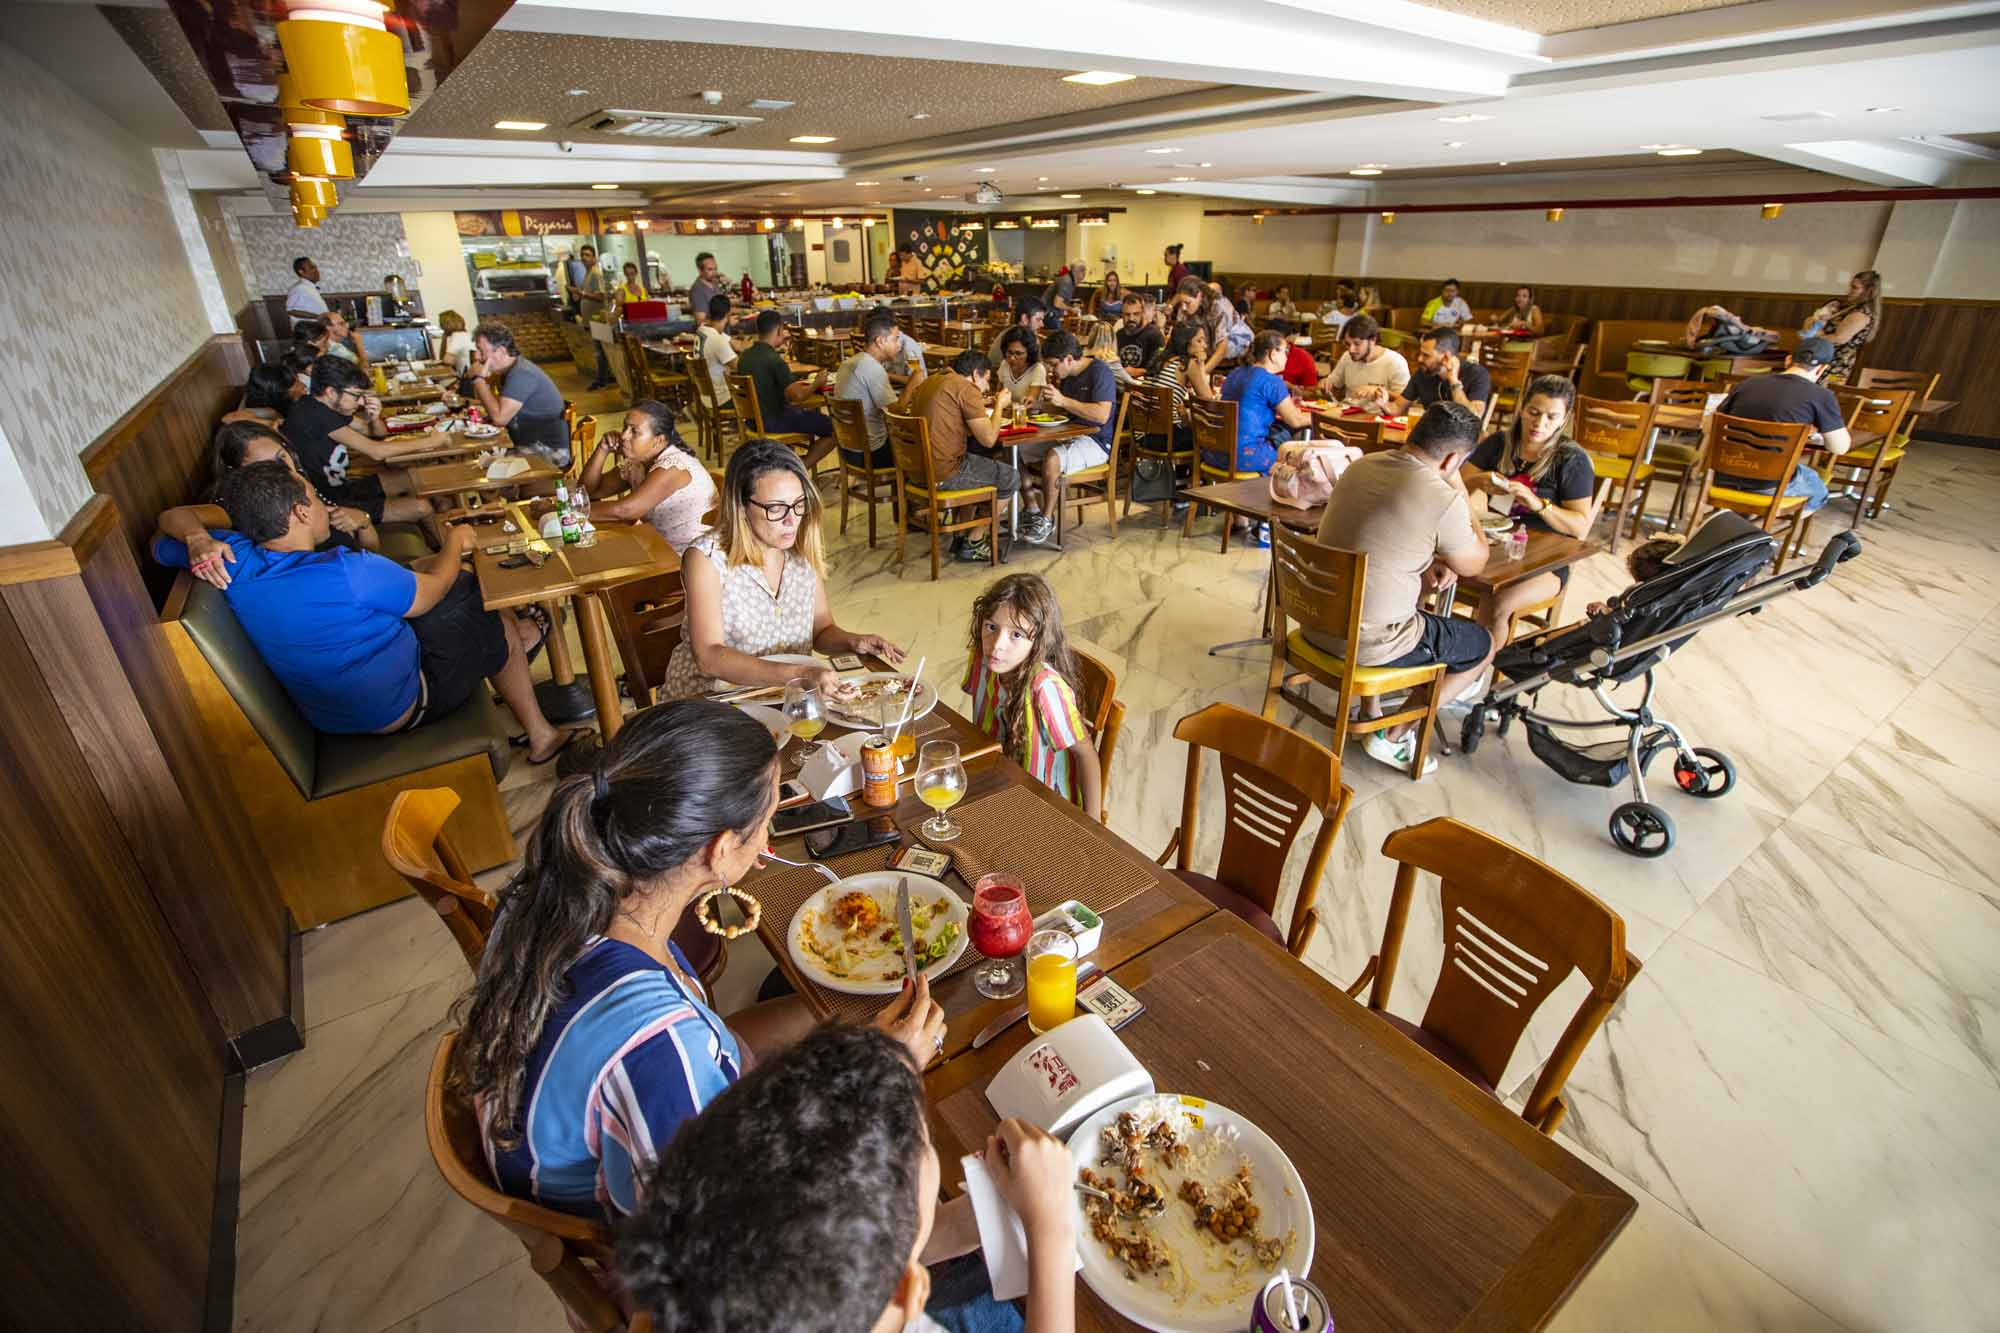 Restaurante La Fiera  Lauro de Freitas Bahia, Estrada do Coco, Lugar Perfeito